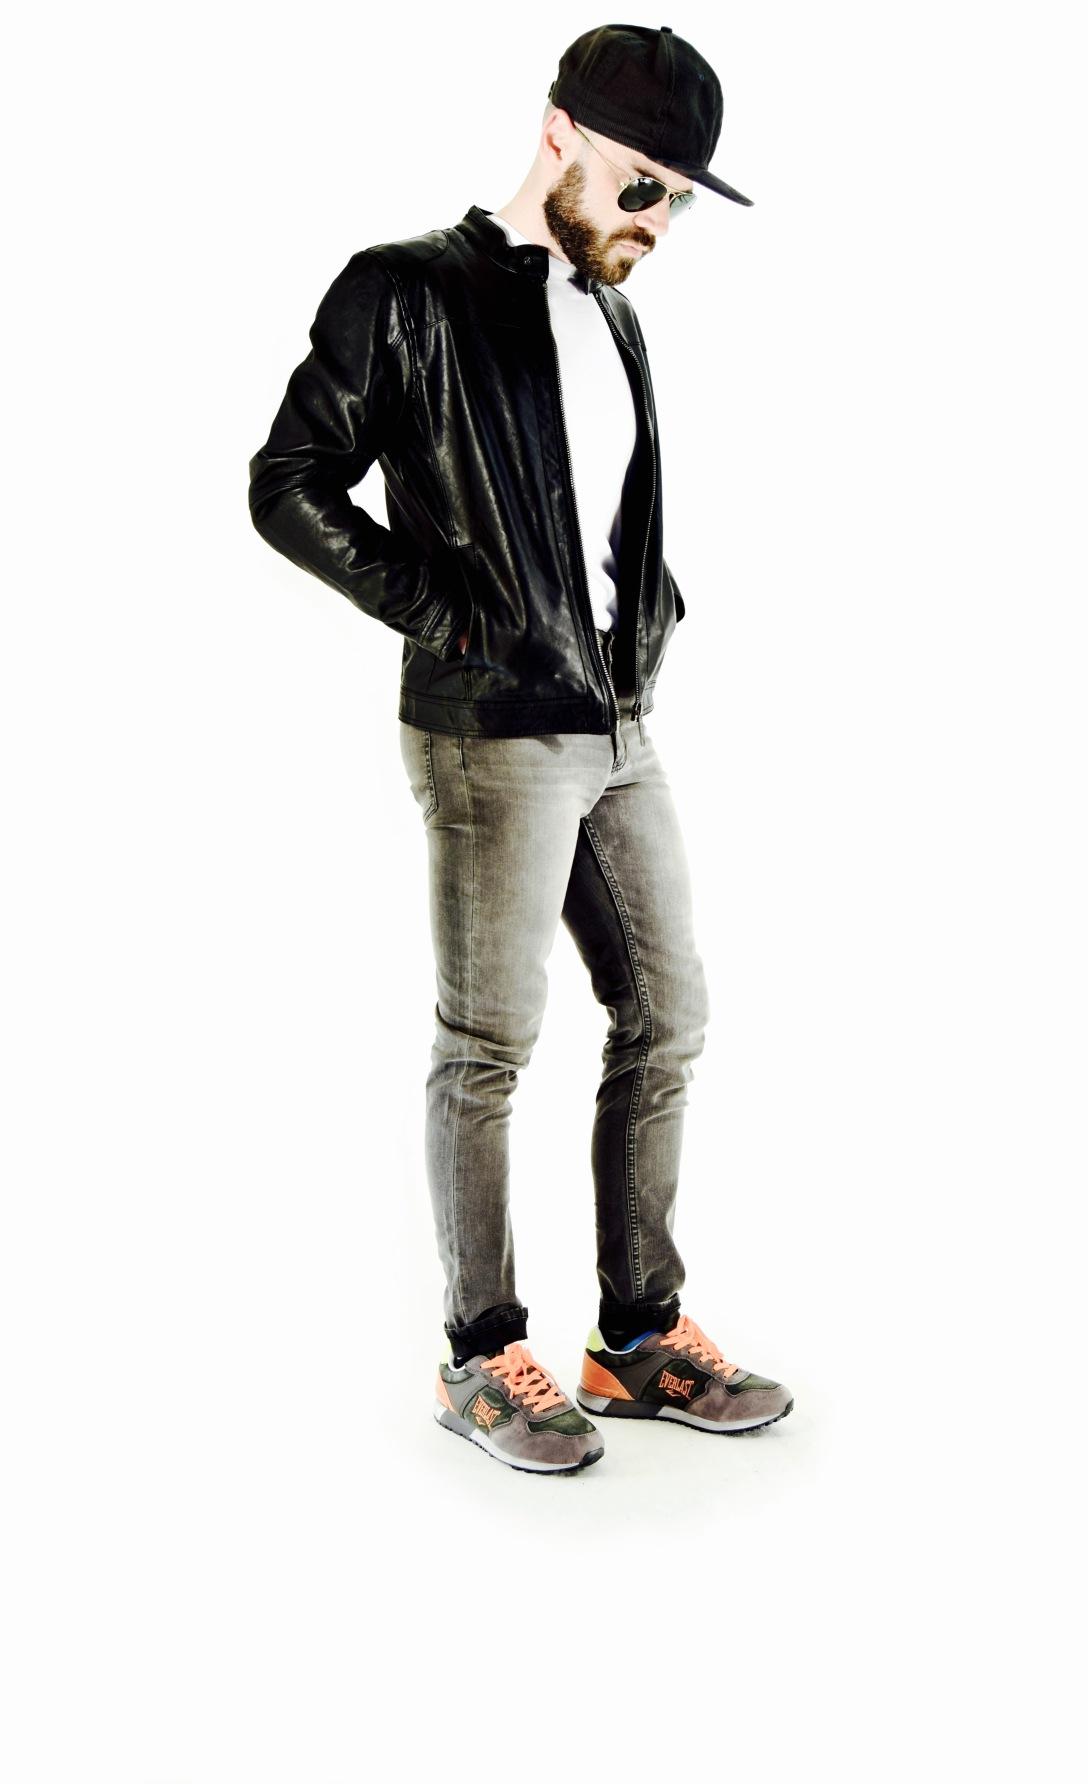 fashionblogger, rayban, hat, jacket, jeans,